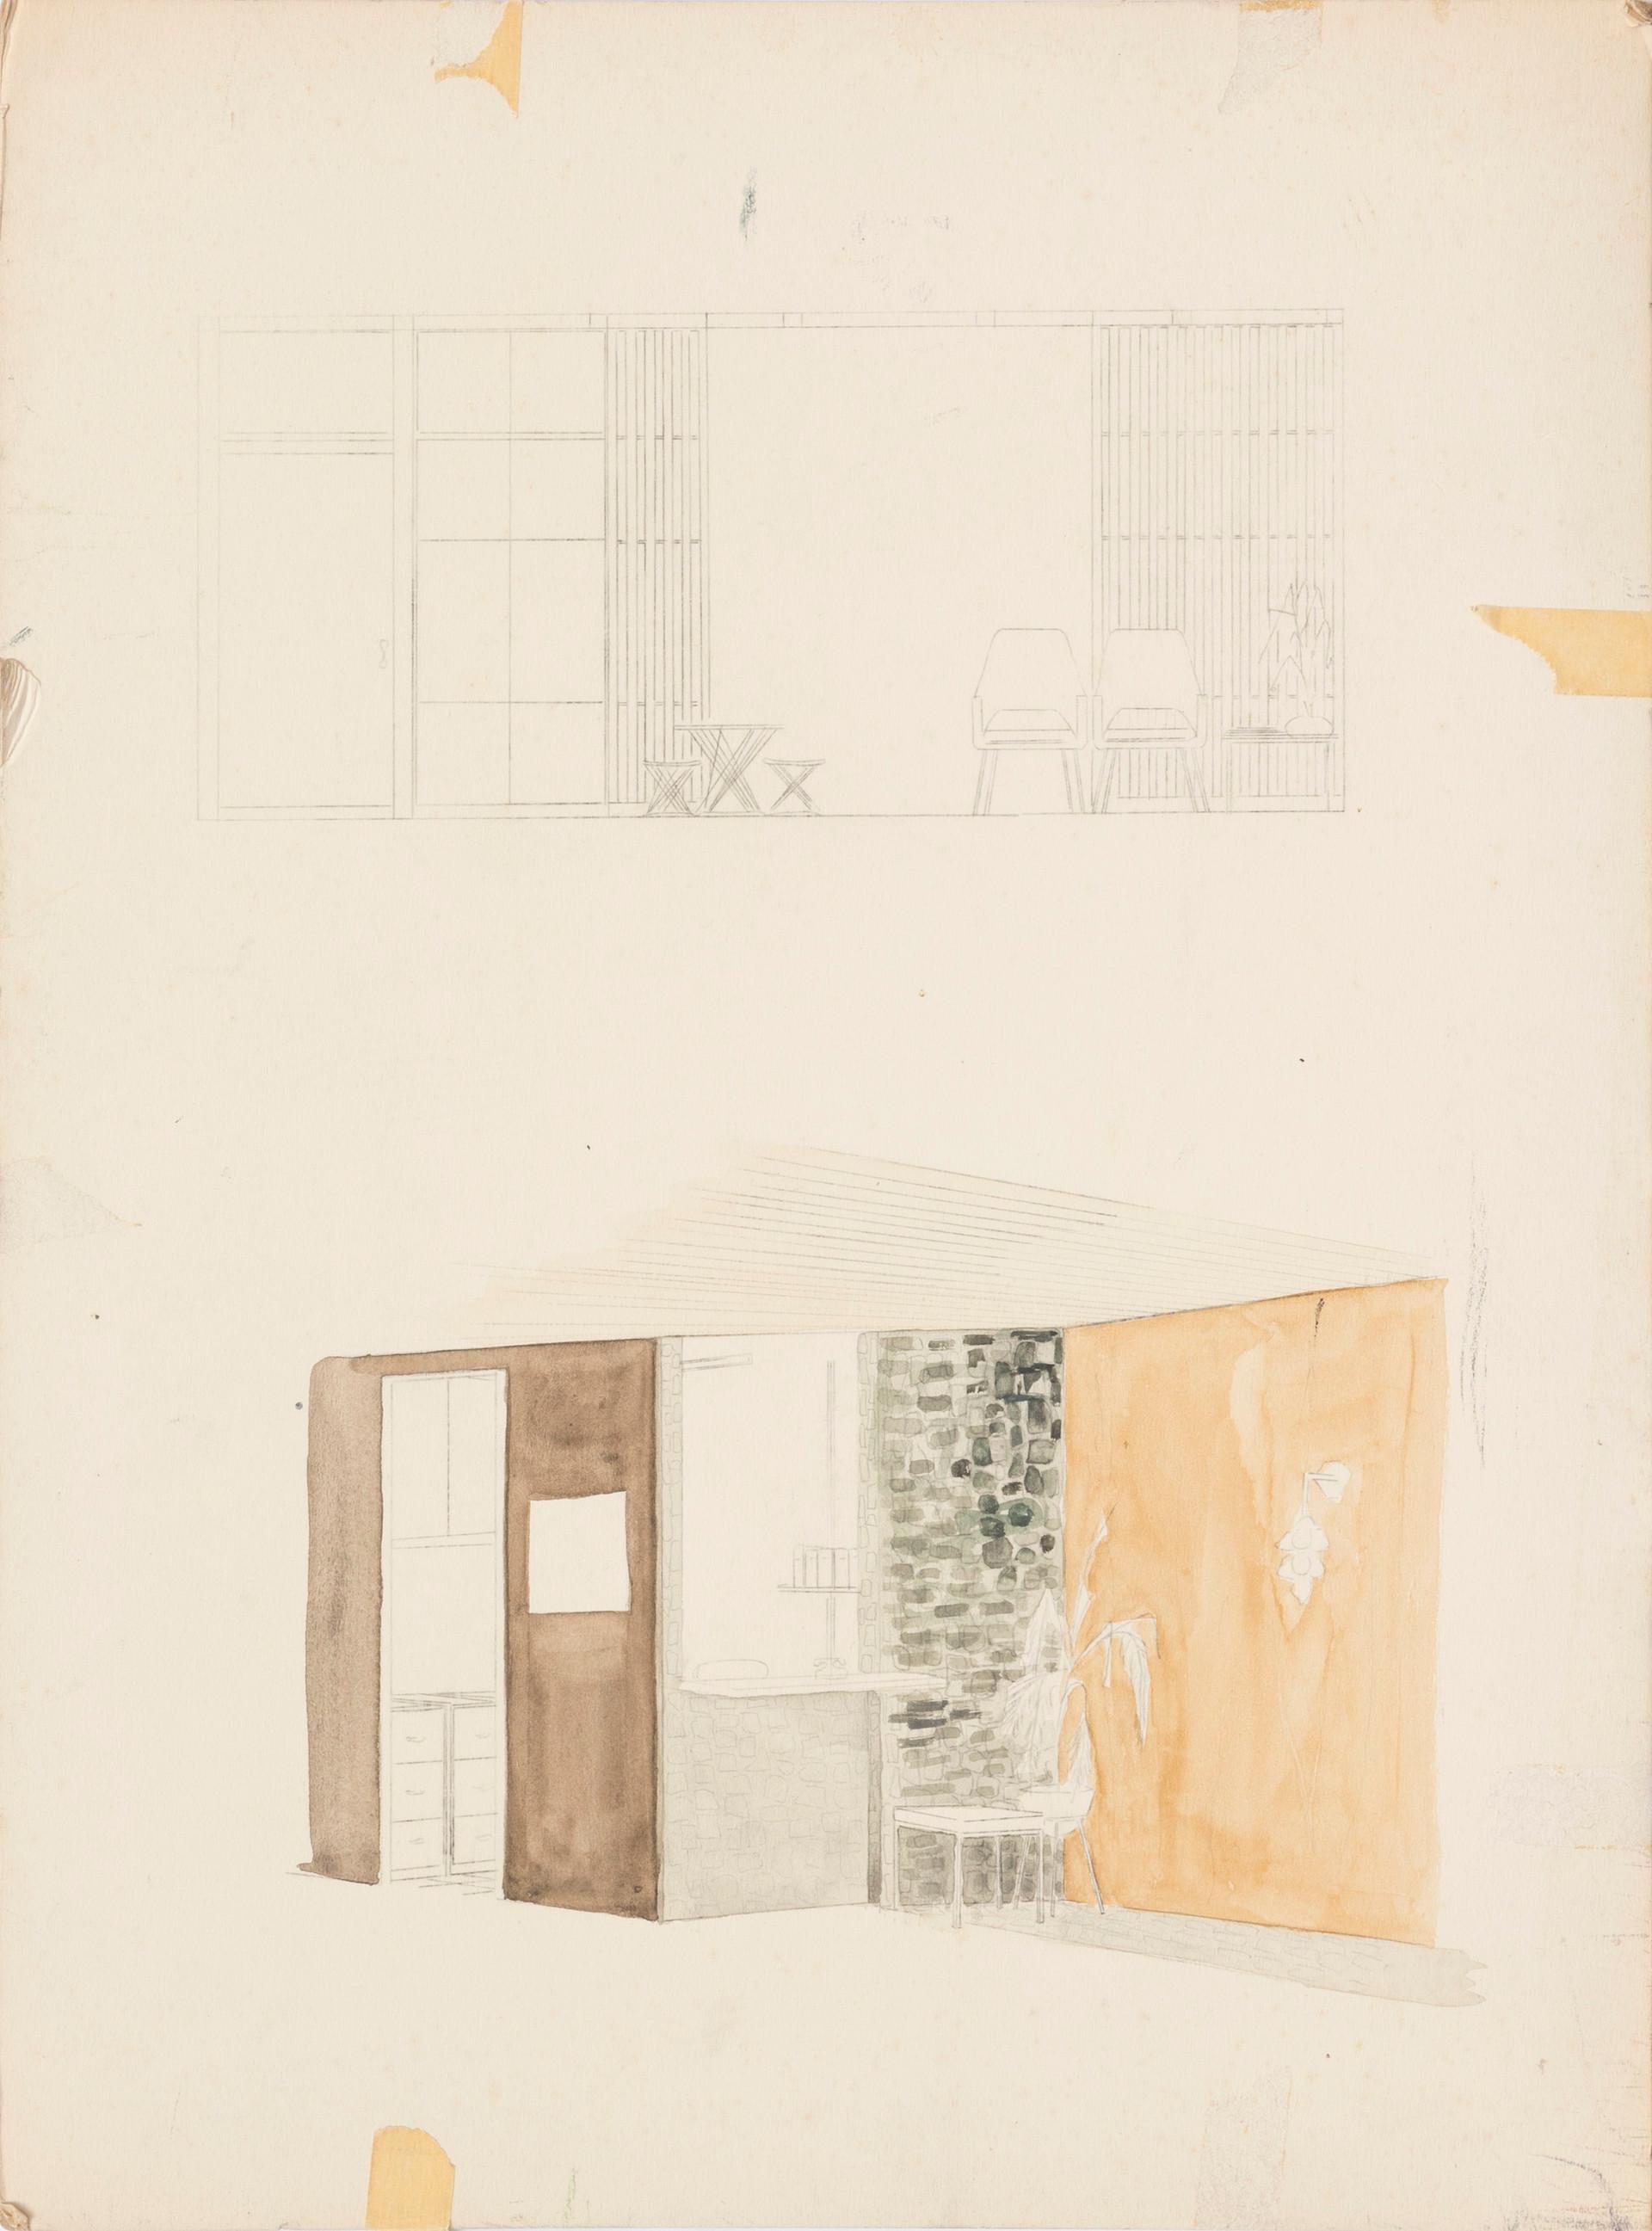 Untitled sketch - sketches of interior scene